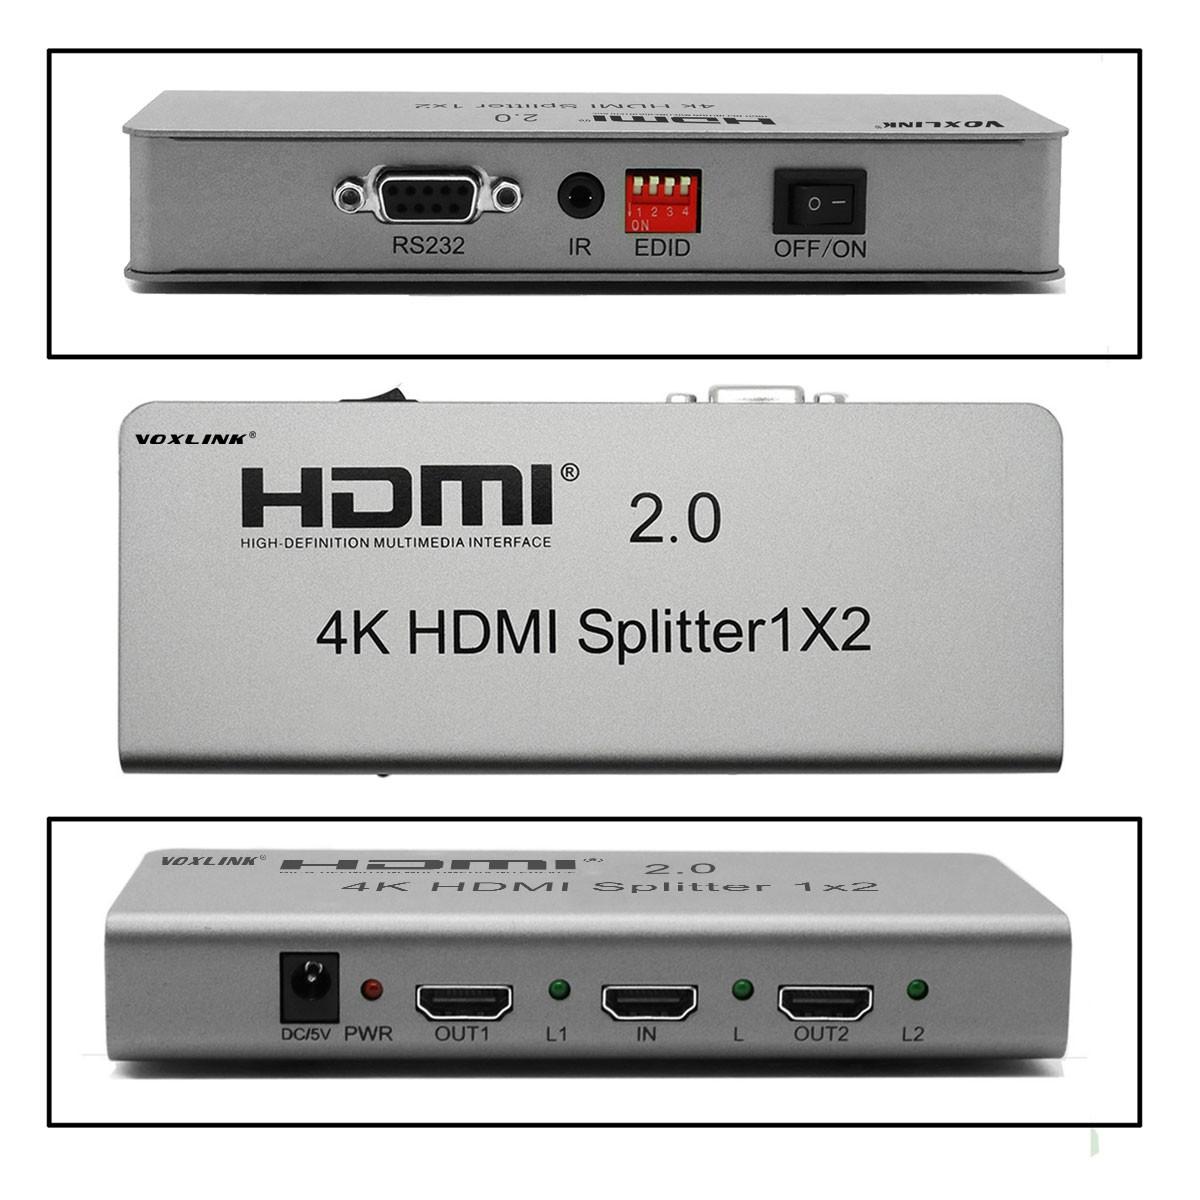 VOXLINK NEW 1X2 HDMI 2.0 HDMI Splitter 4K (HDMI 2.0,HDCP2.2 ,4K,IR Extension, EDID Mangement, RS232 US